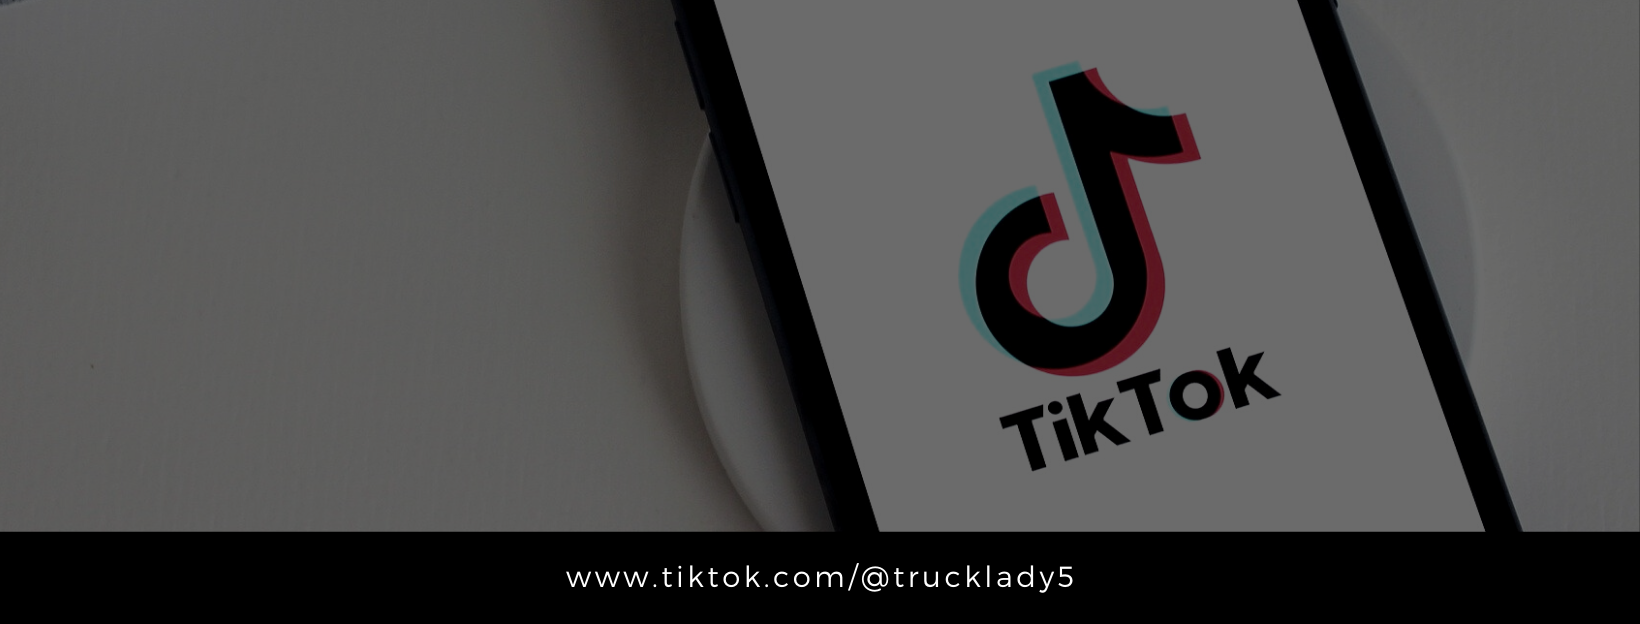 tiktok_trucklady5